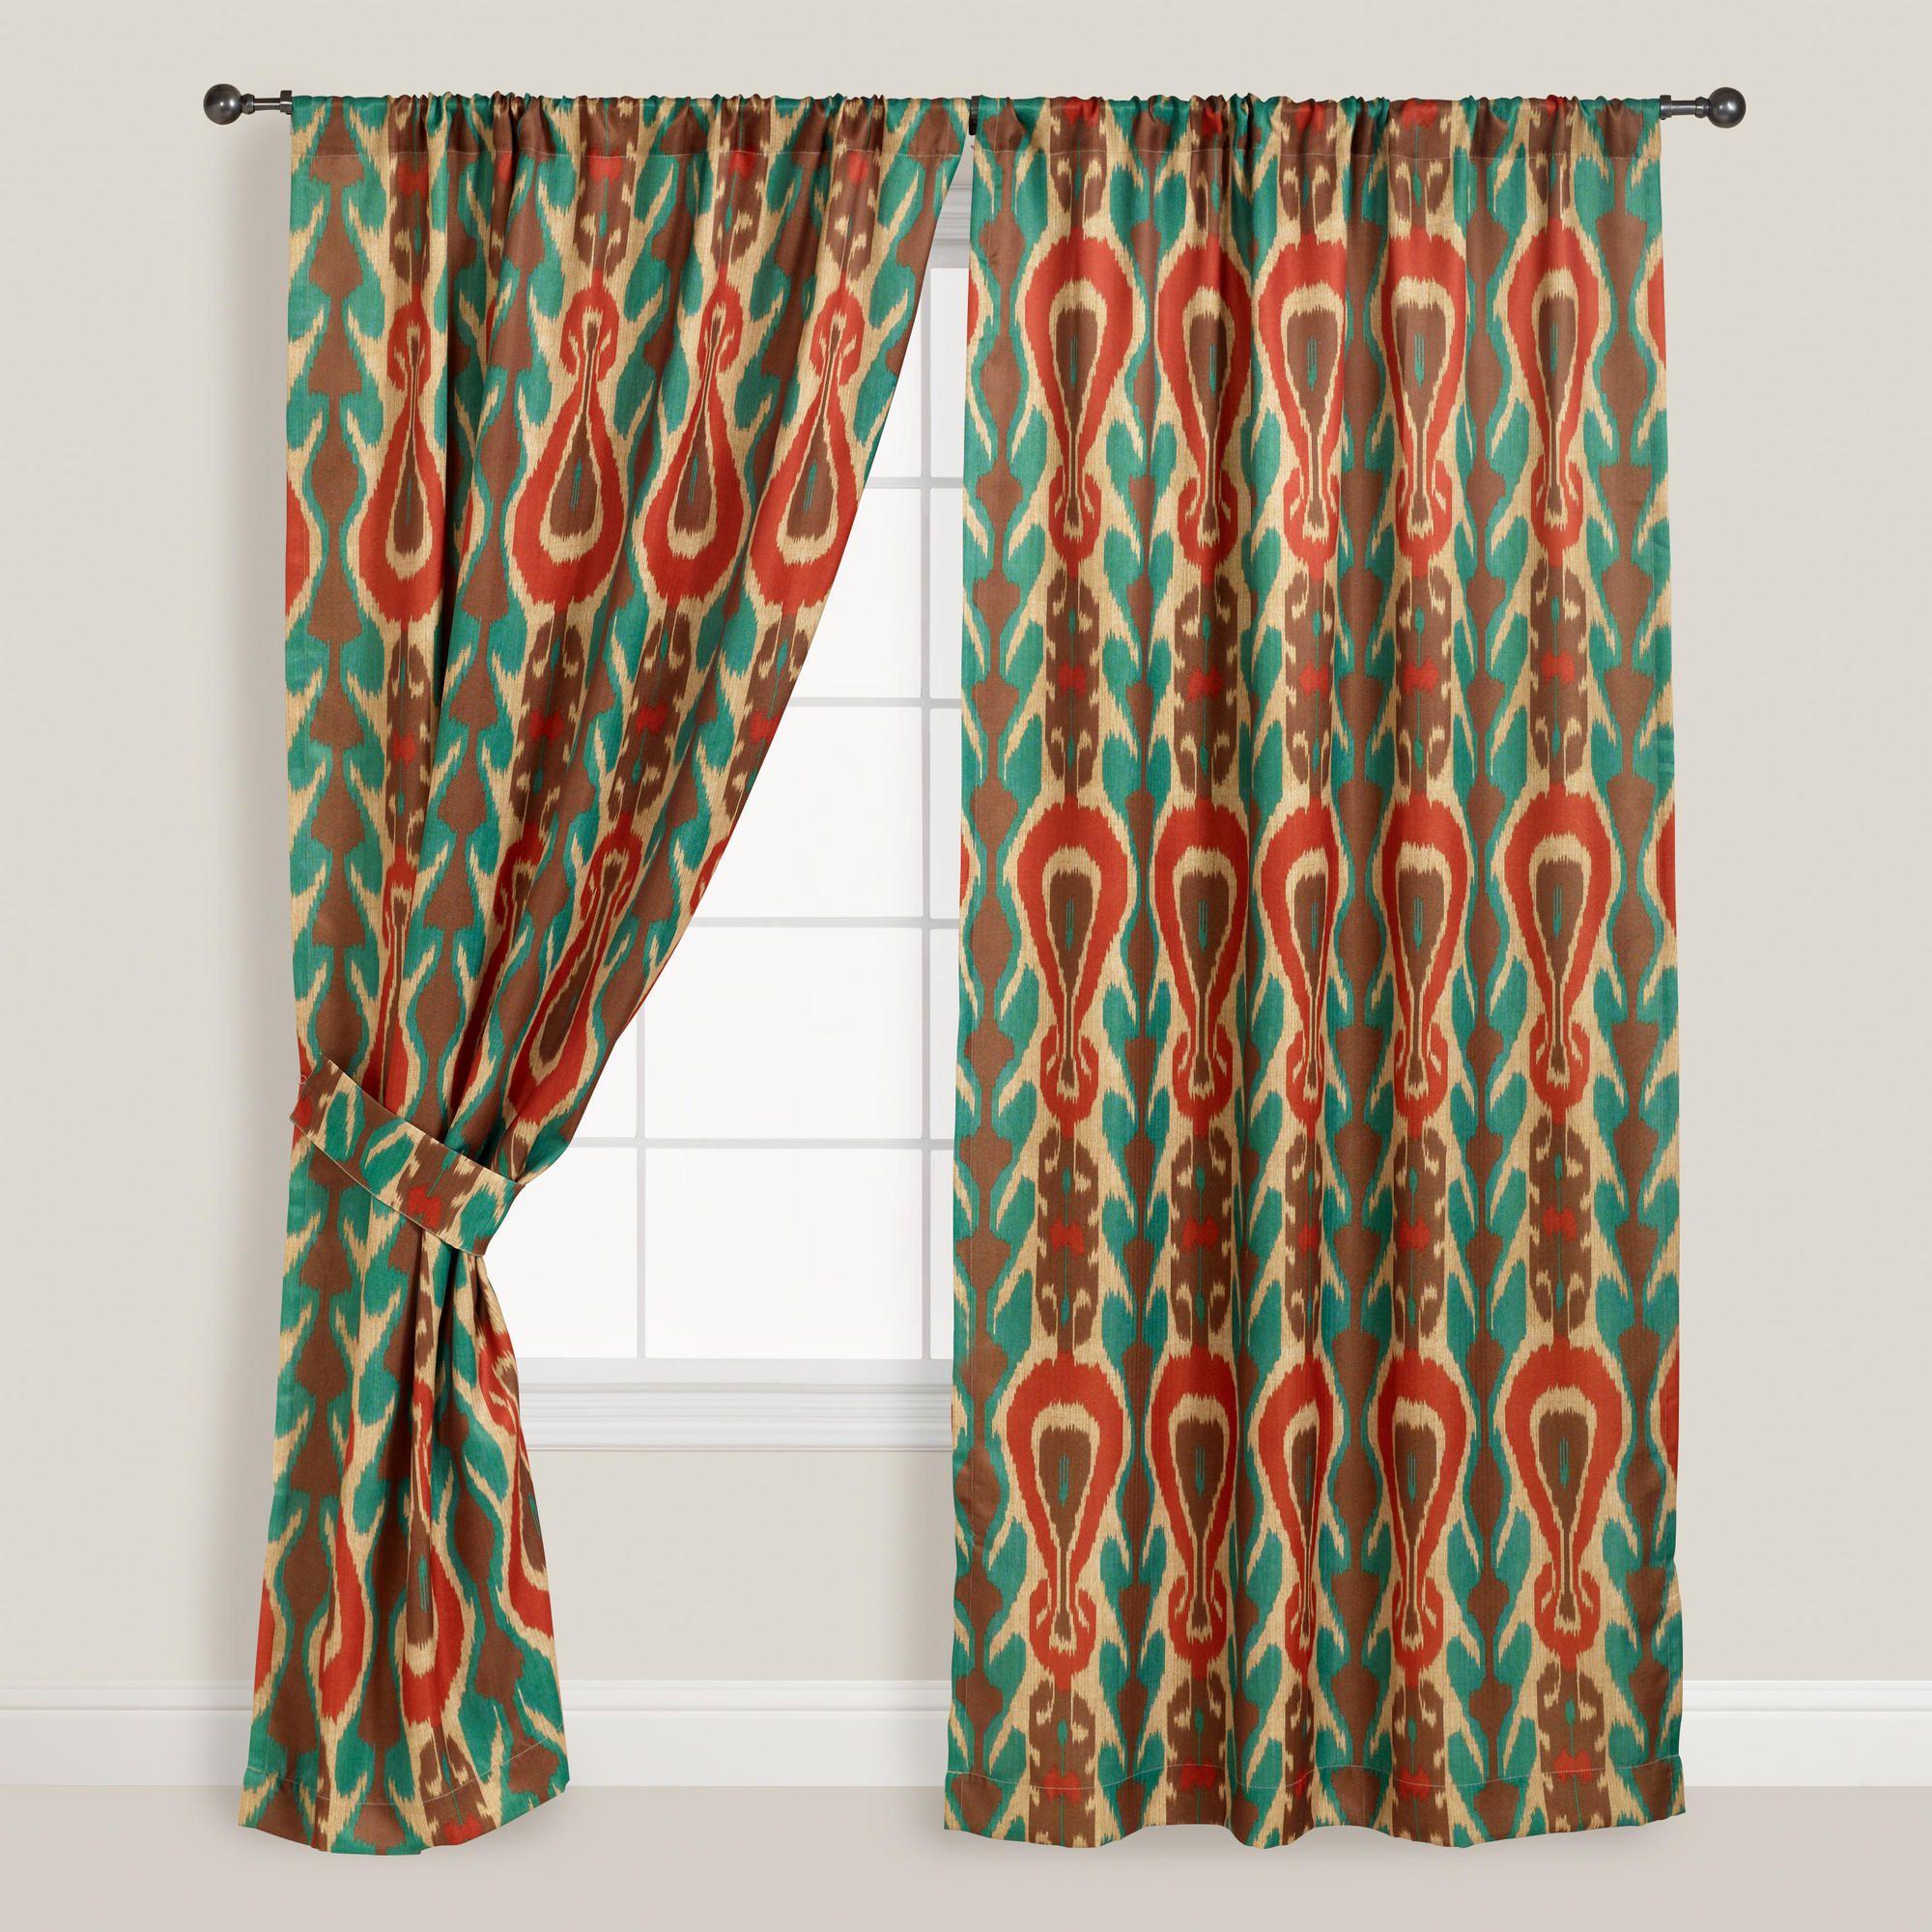 Amazing Diva Ikat Curtain | World Market